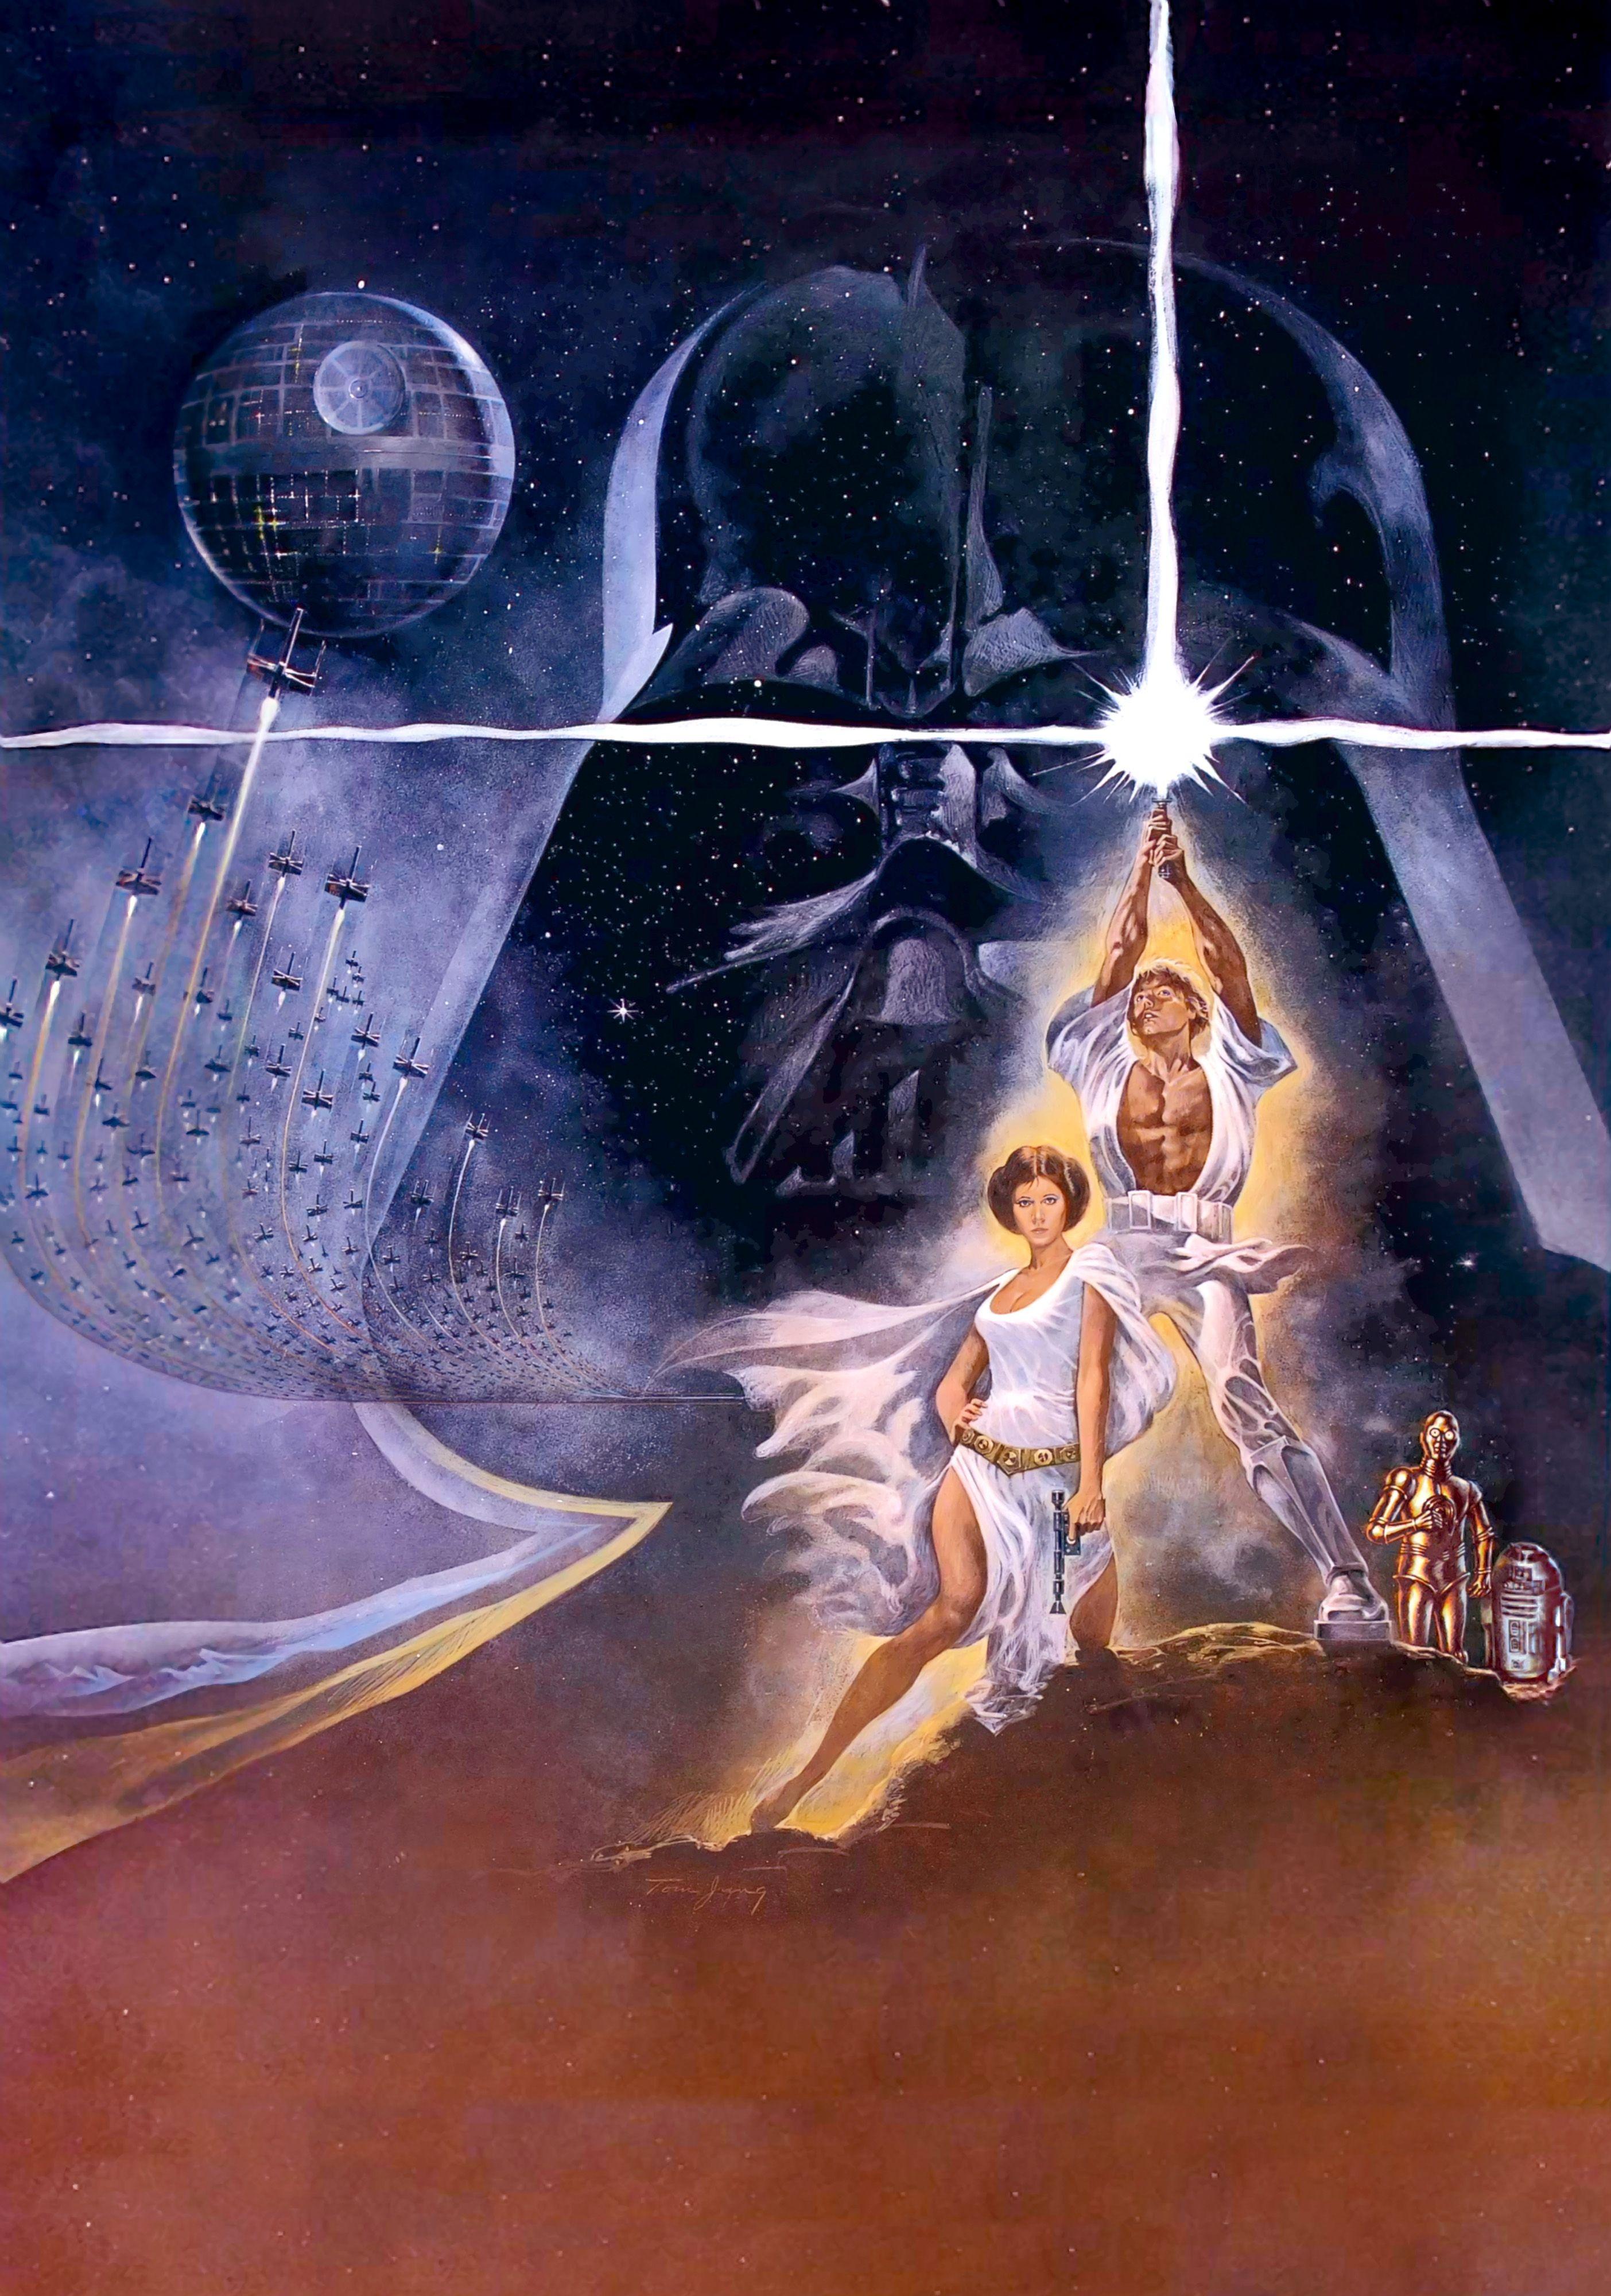 The Thing Star Wars Episoden Star Wars Poster Star Wars Film